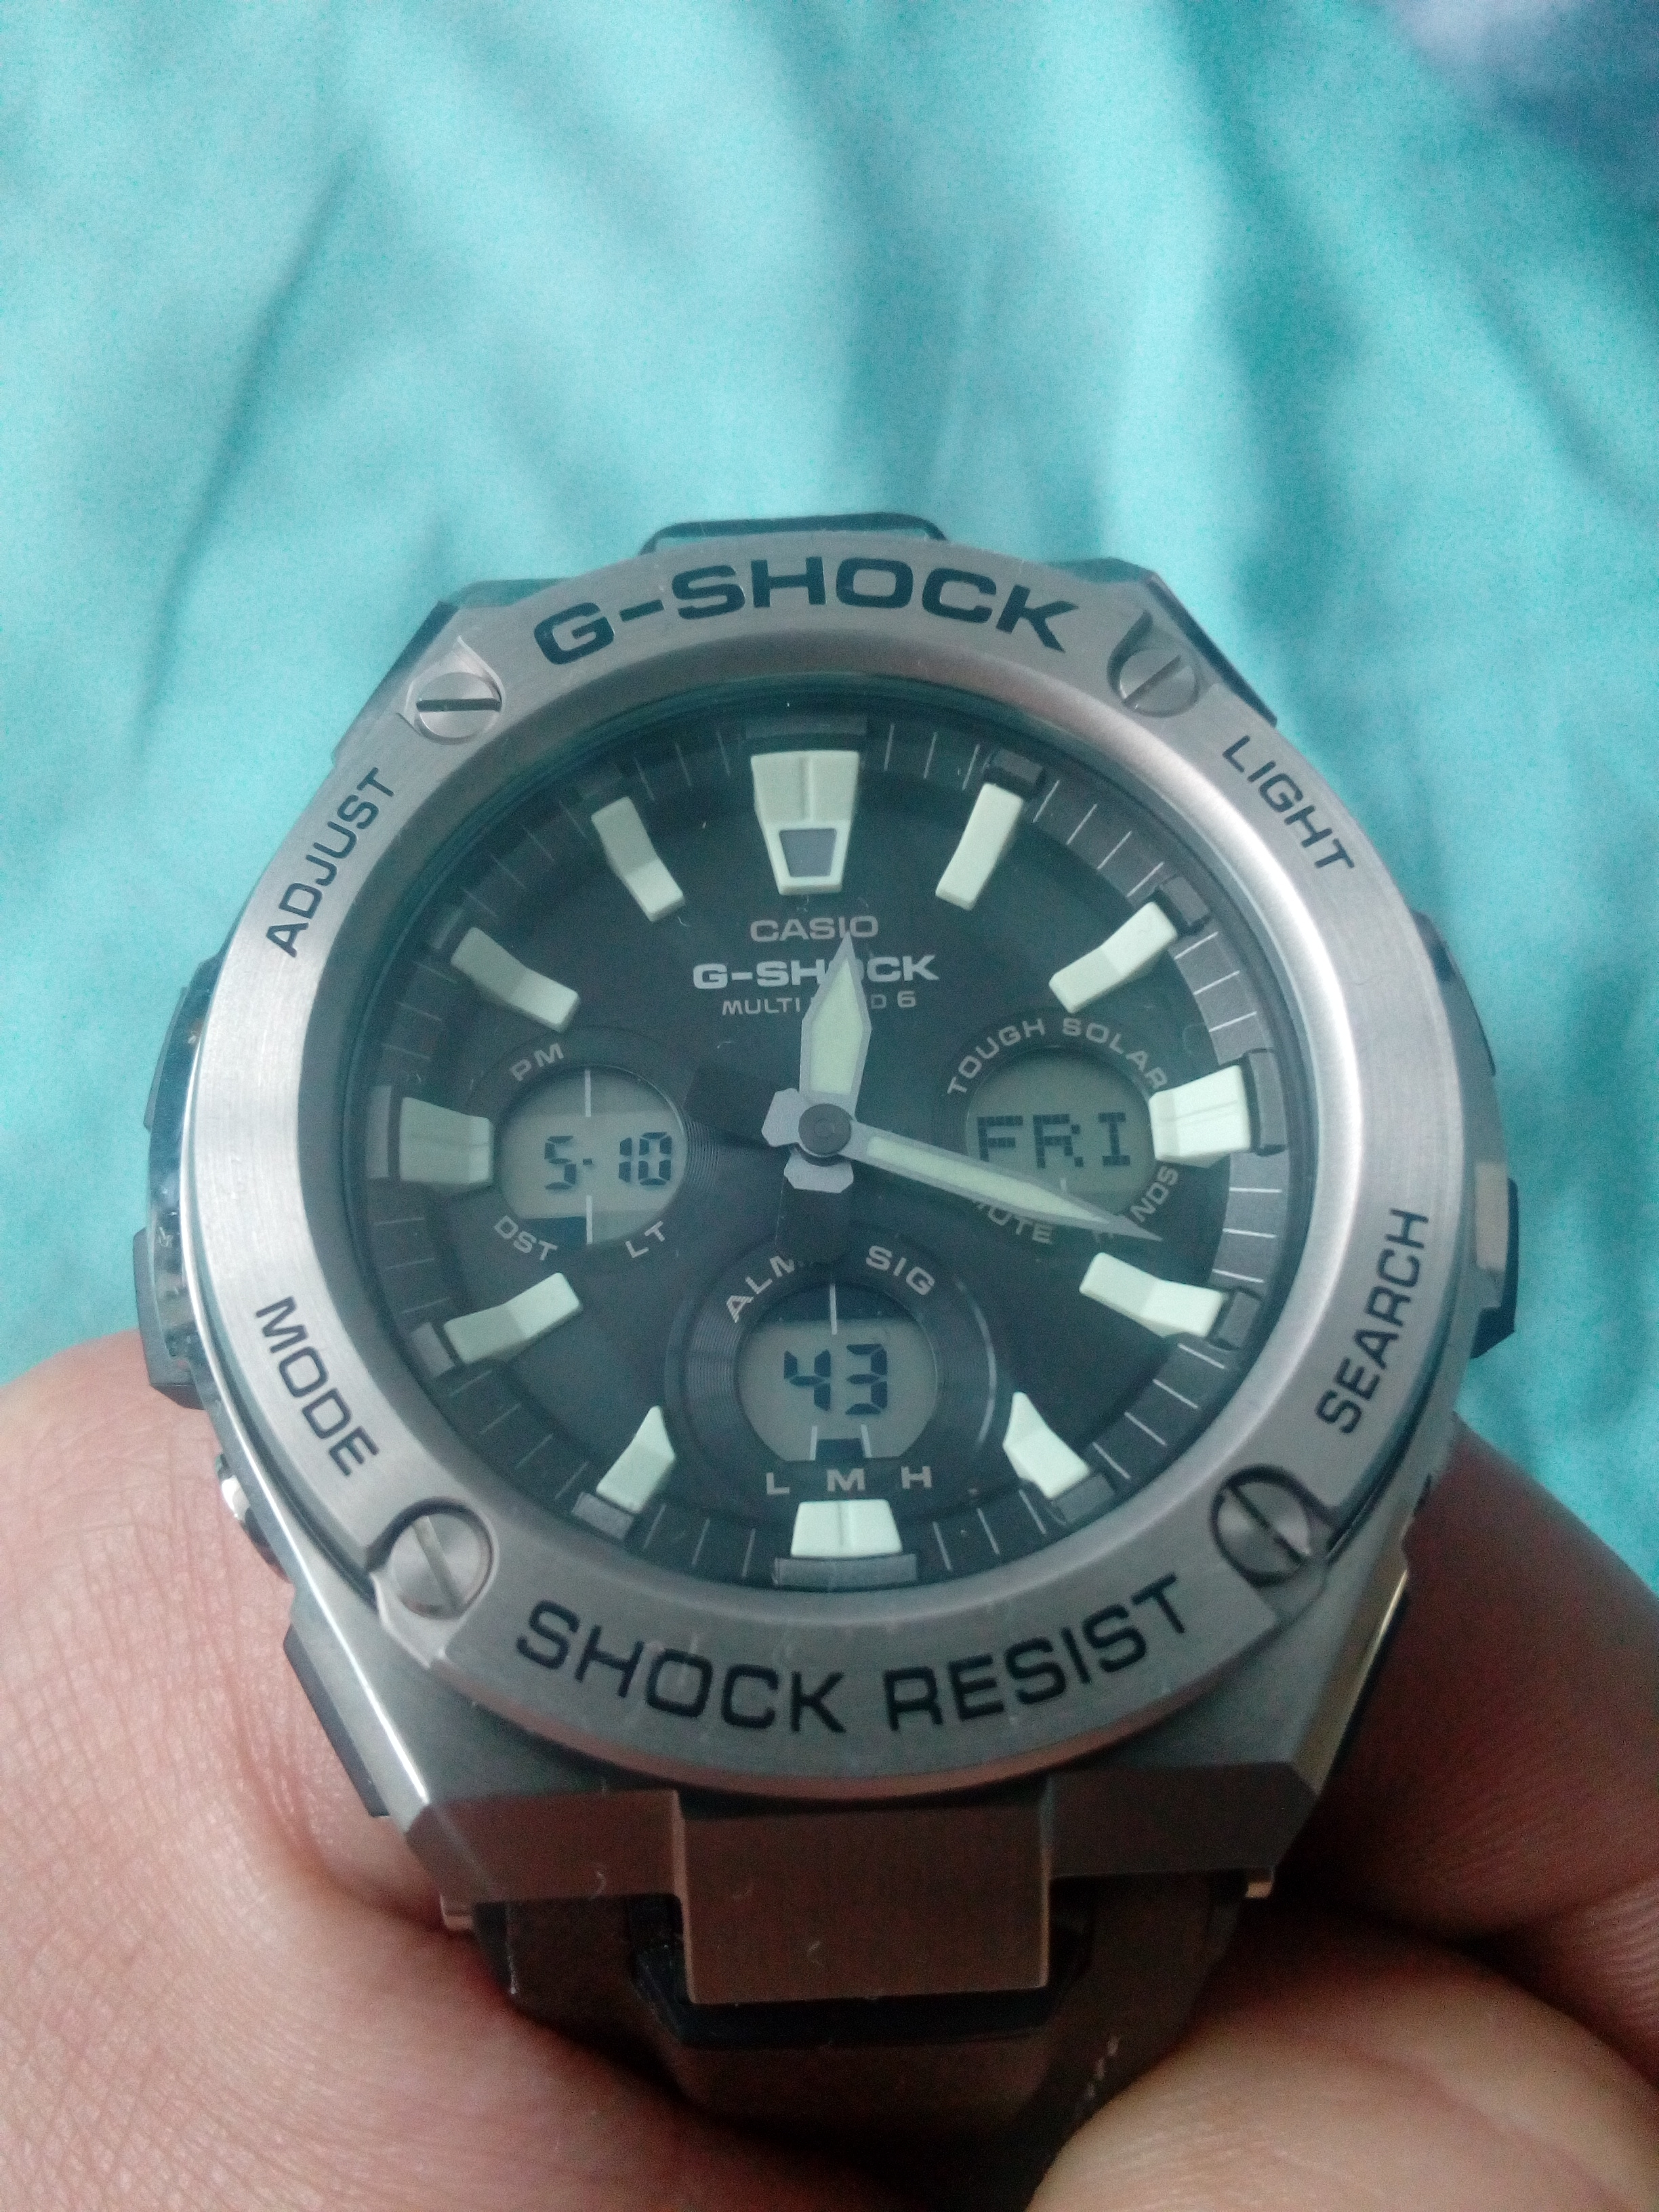 ee2b0ea9b Brown Leather GST-W130L-1AER Casio G-Shock Watch | Watches2U